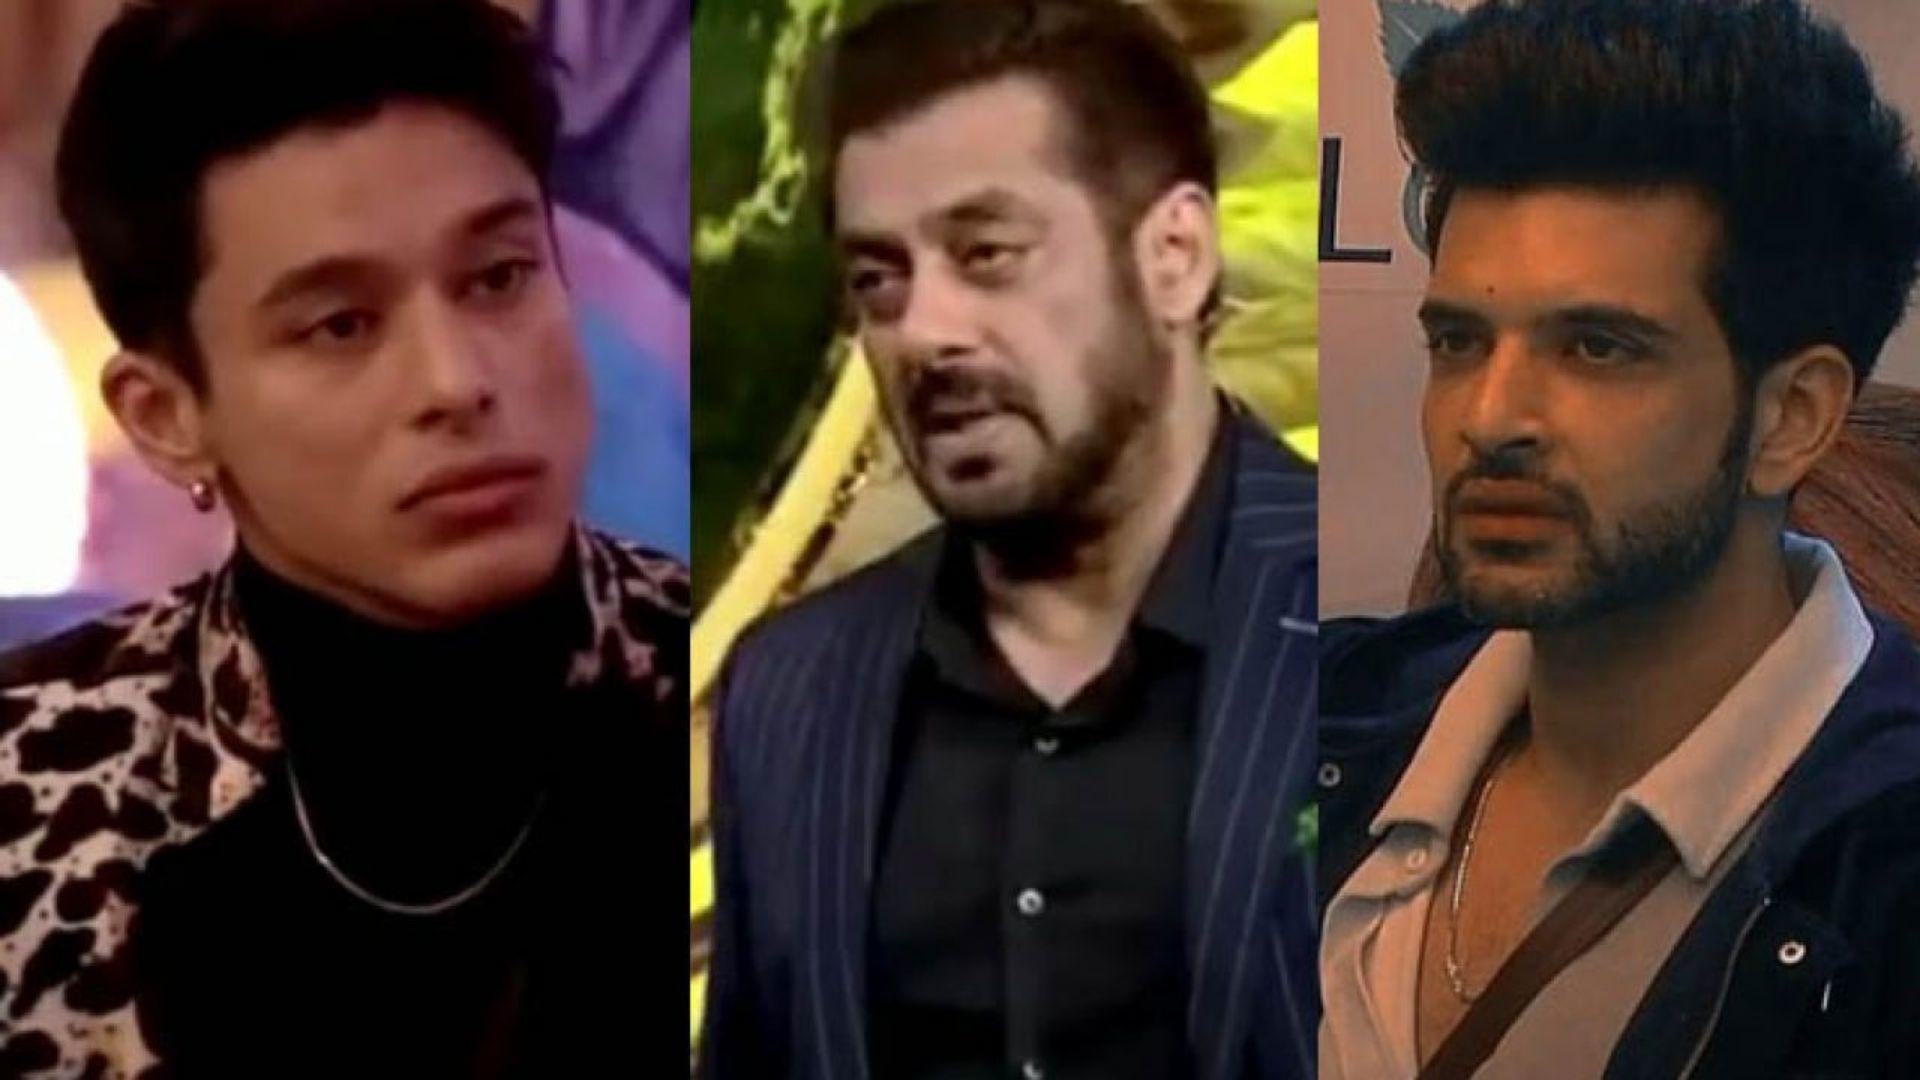 Bigg Boss 15 Weekend Ka Vaar: Salman Khan Slams Karan Kundrra For Pinning Down Pratik Sehajpal; 'Ek Din Aapko Bhi Koi Aise Hi Patkega'